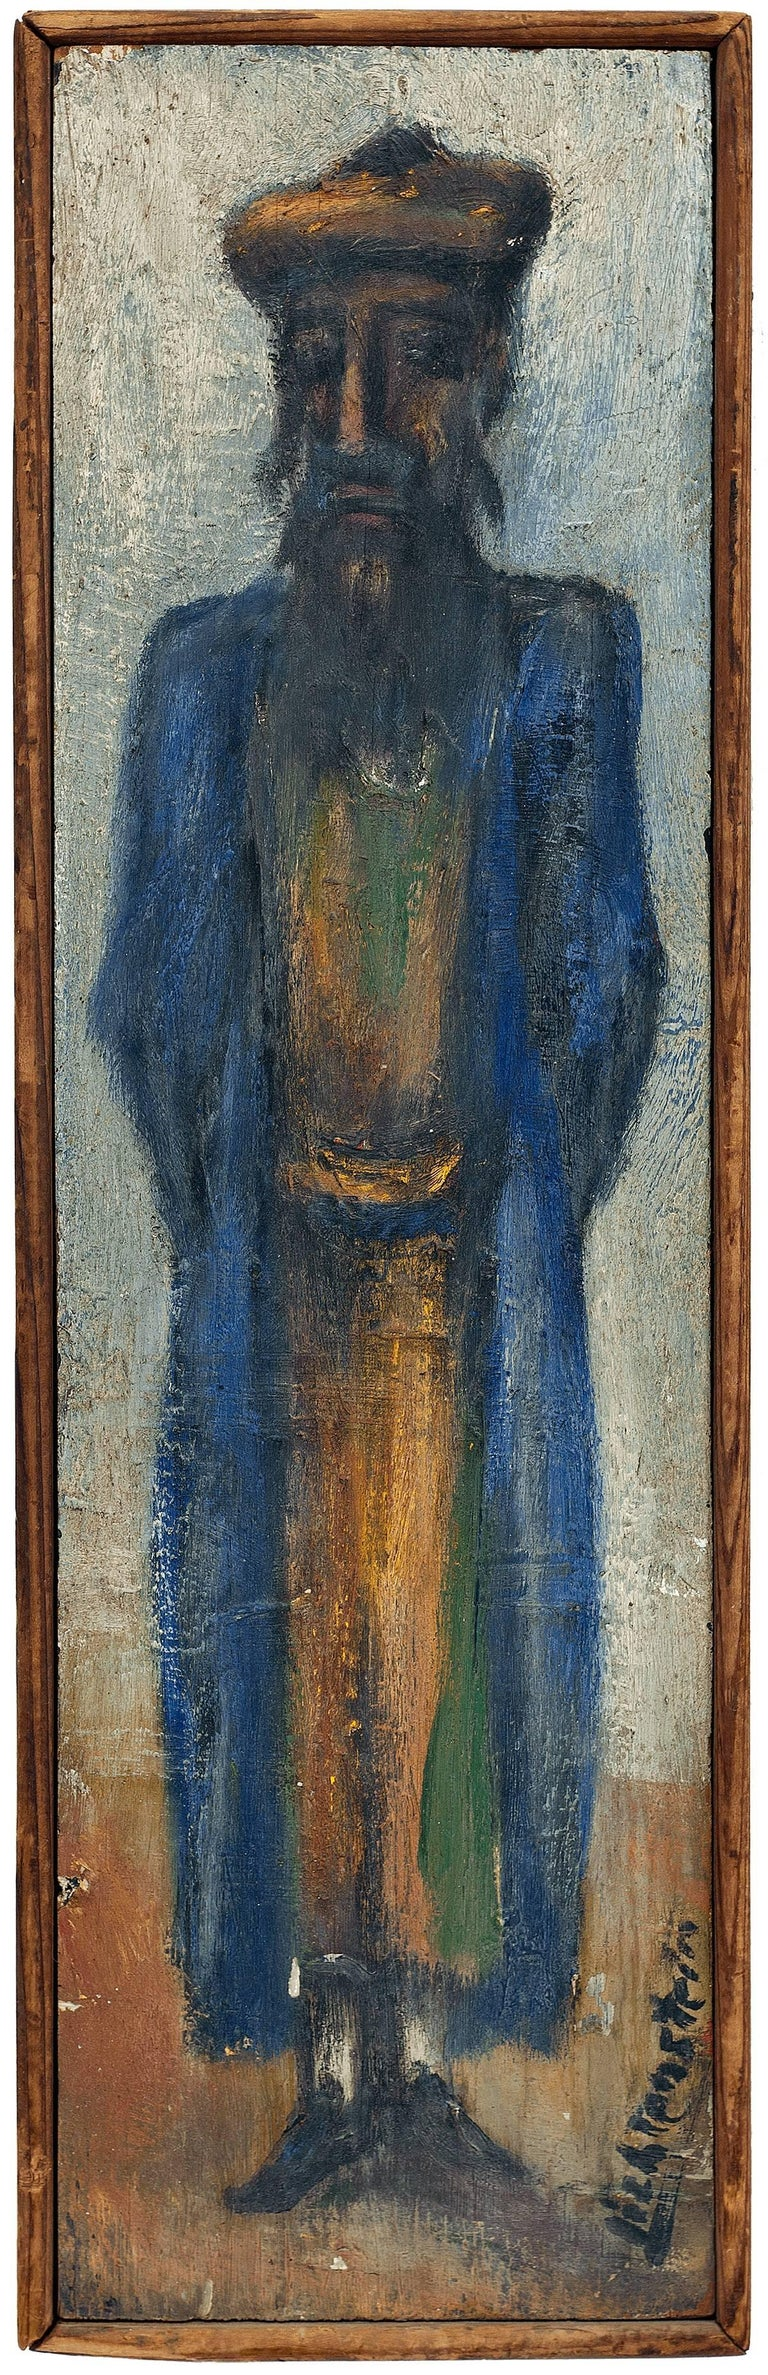 Isaac Lichtenstein - Rare Judaica Oil Painting. Bezalel School, Jerusalem Rabbi 1